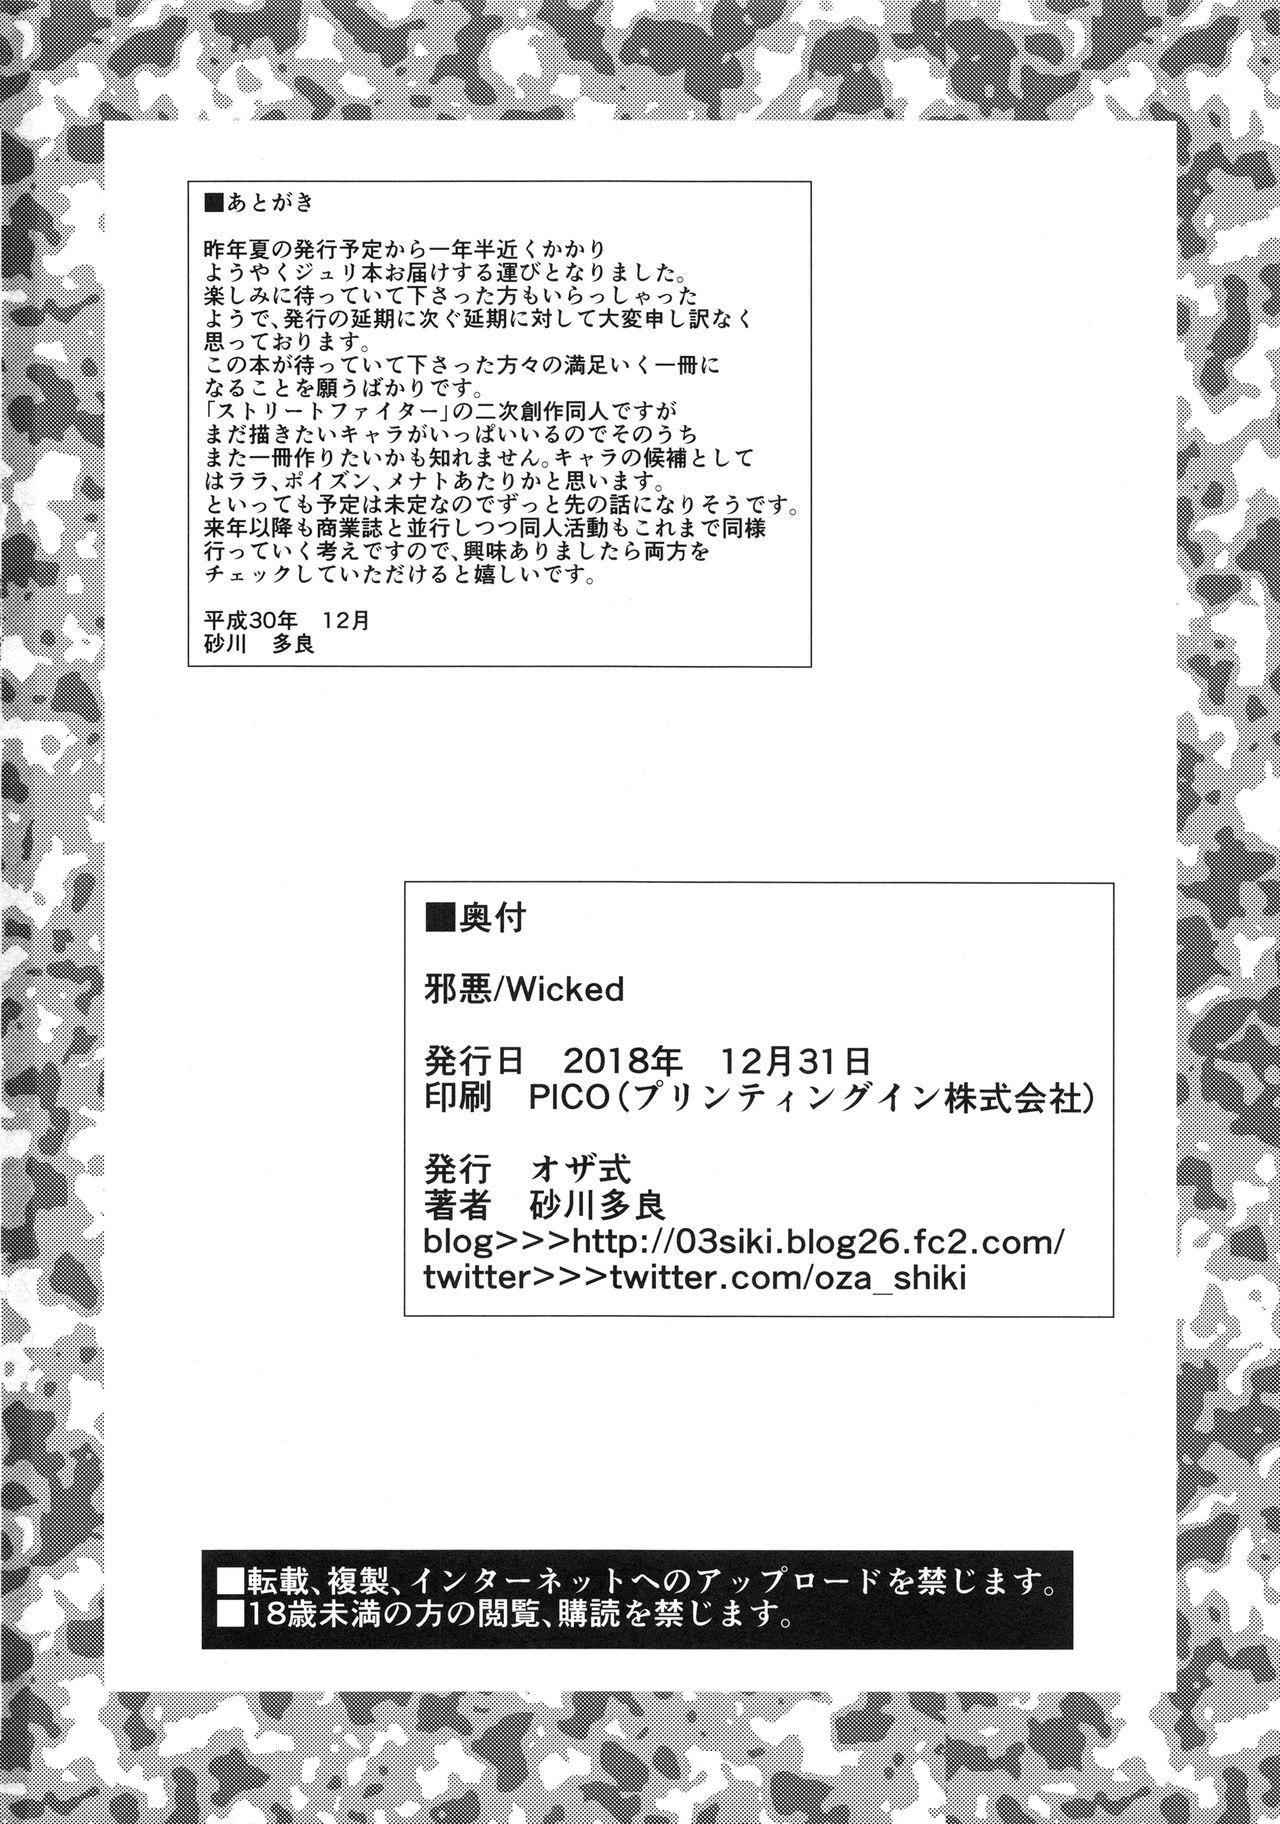 Jaaku - Wicked 25